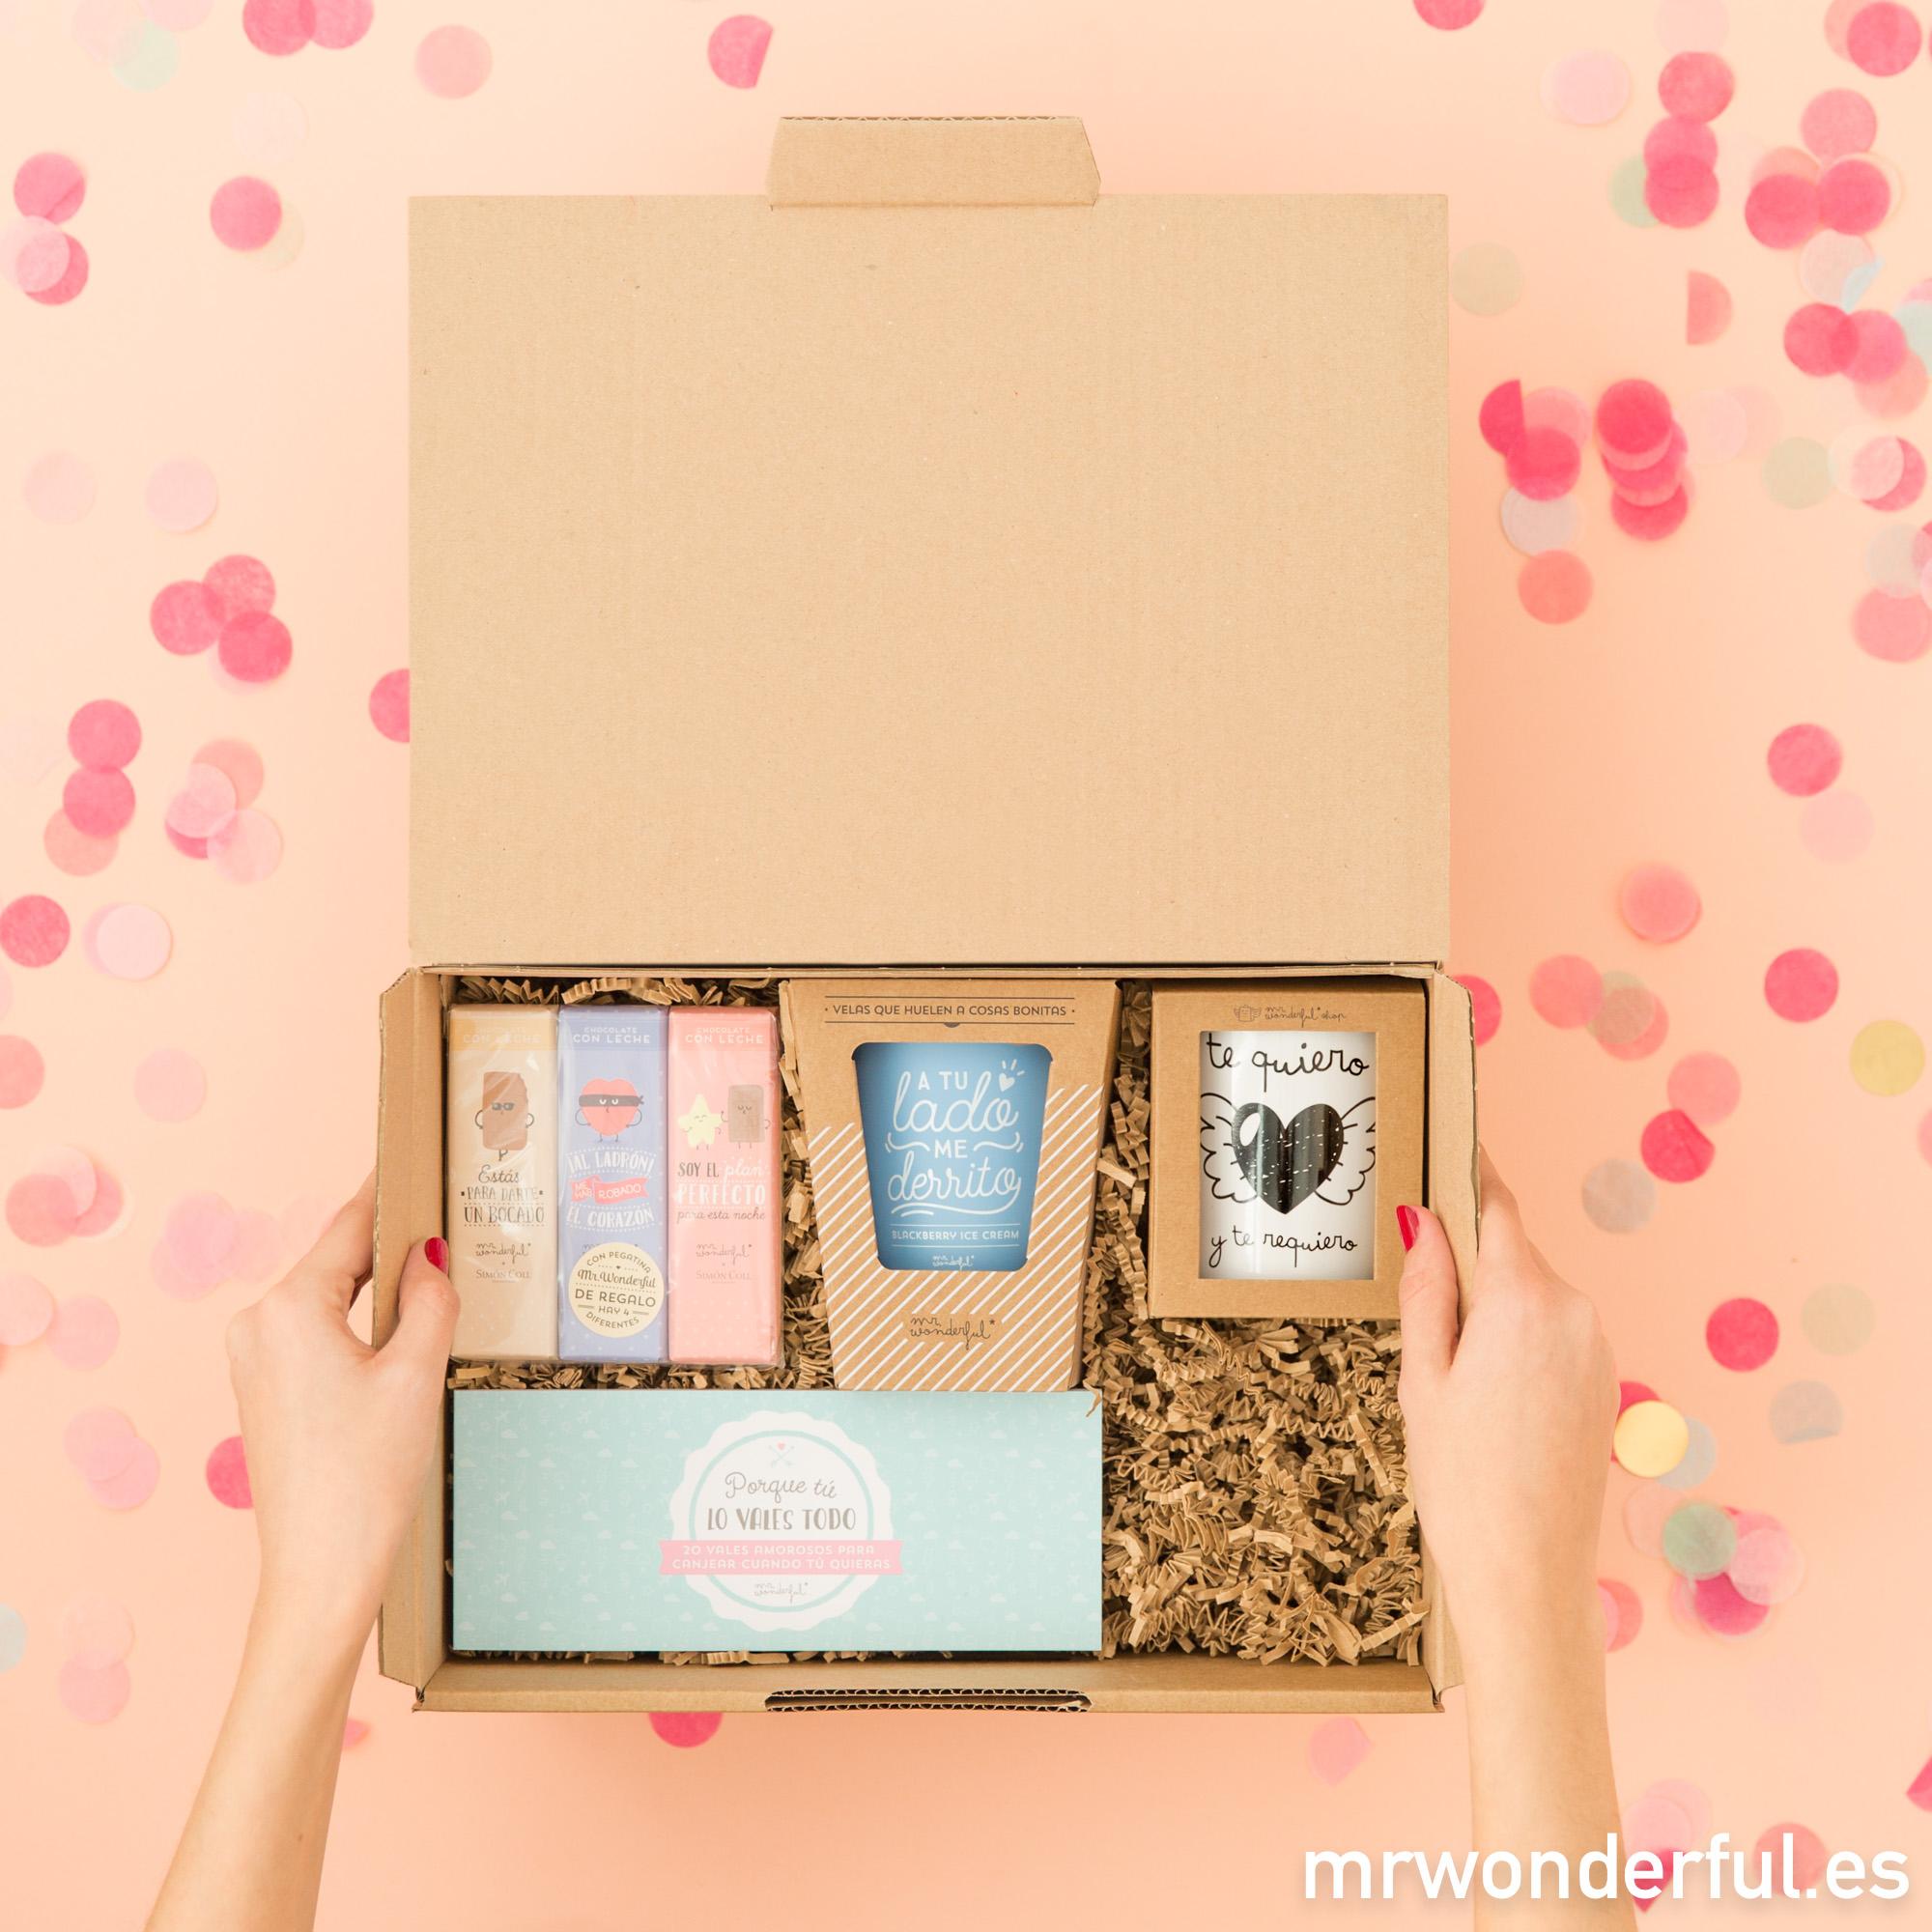 mrwonderful_kits-san-valentin_2017-9-editar